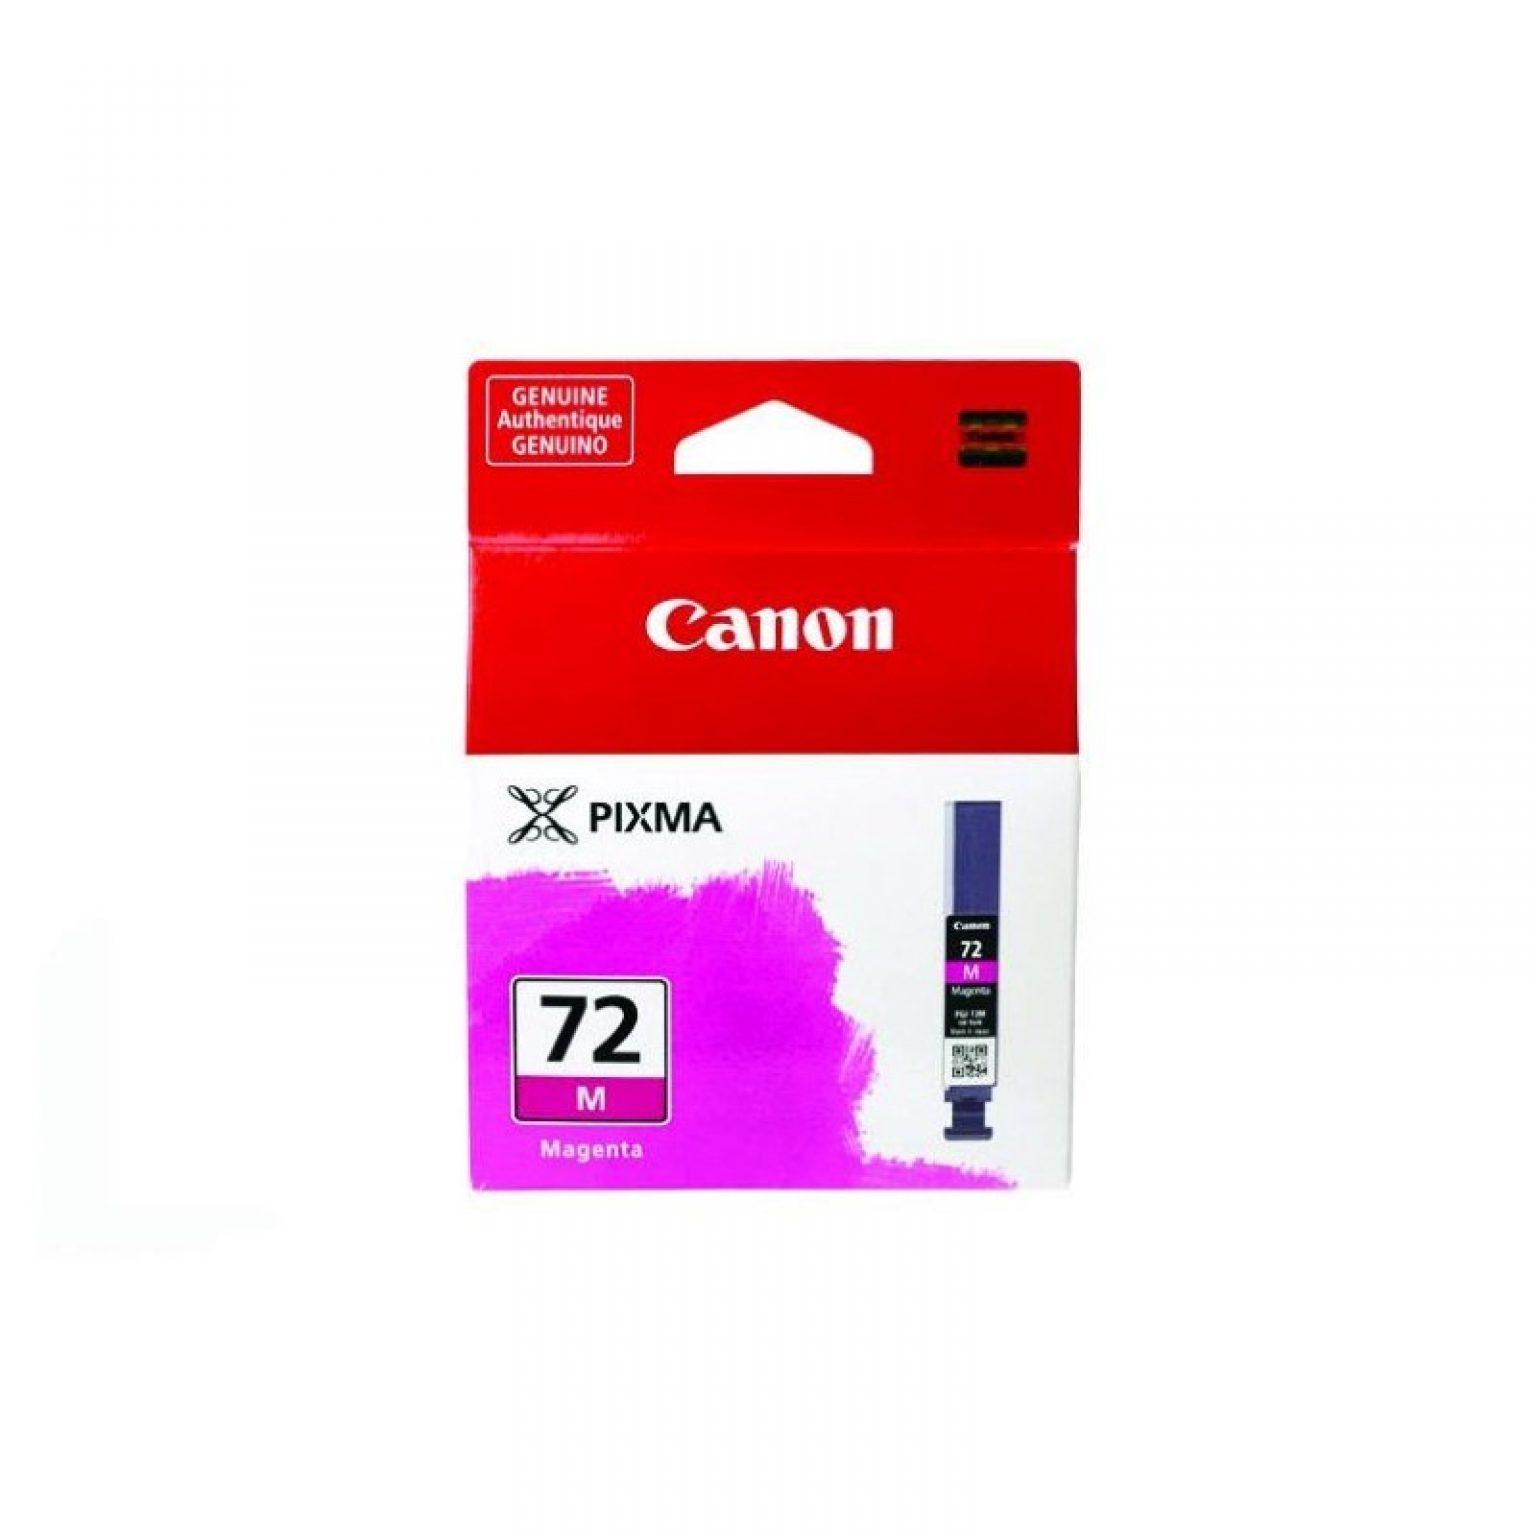 CANON - Ink Cartridge PGI-72 Magenta for Pro-10 [PGI72M]